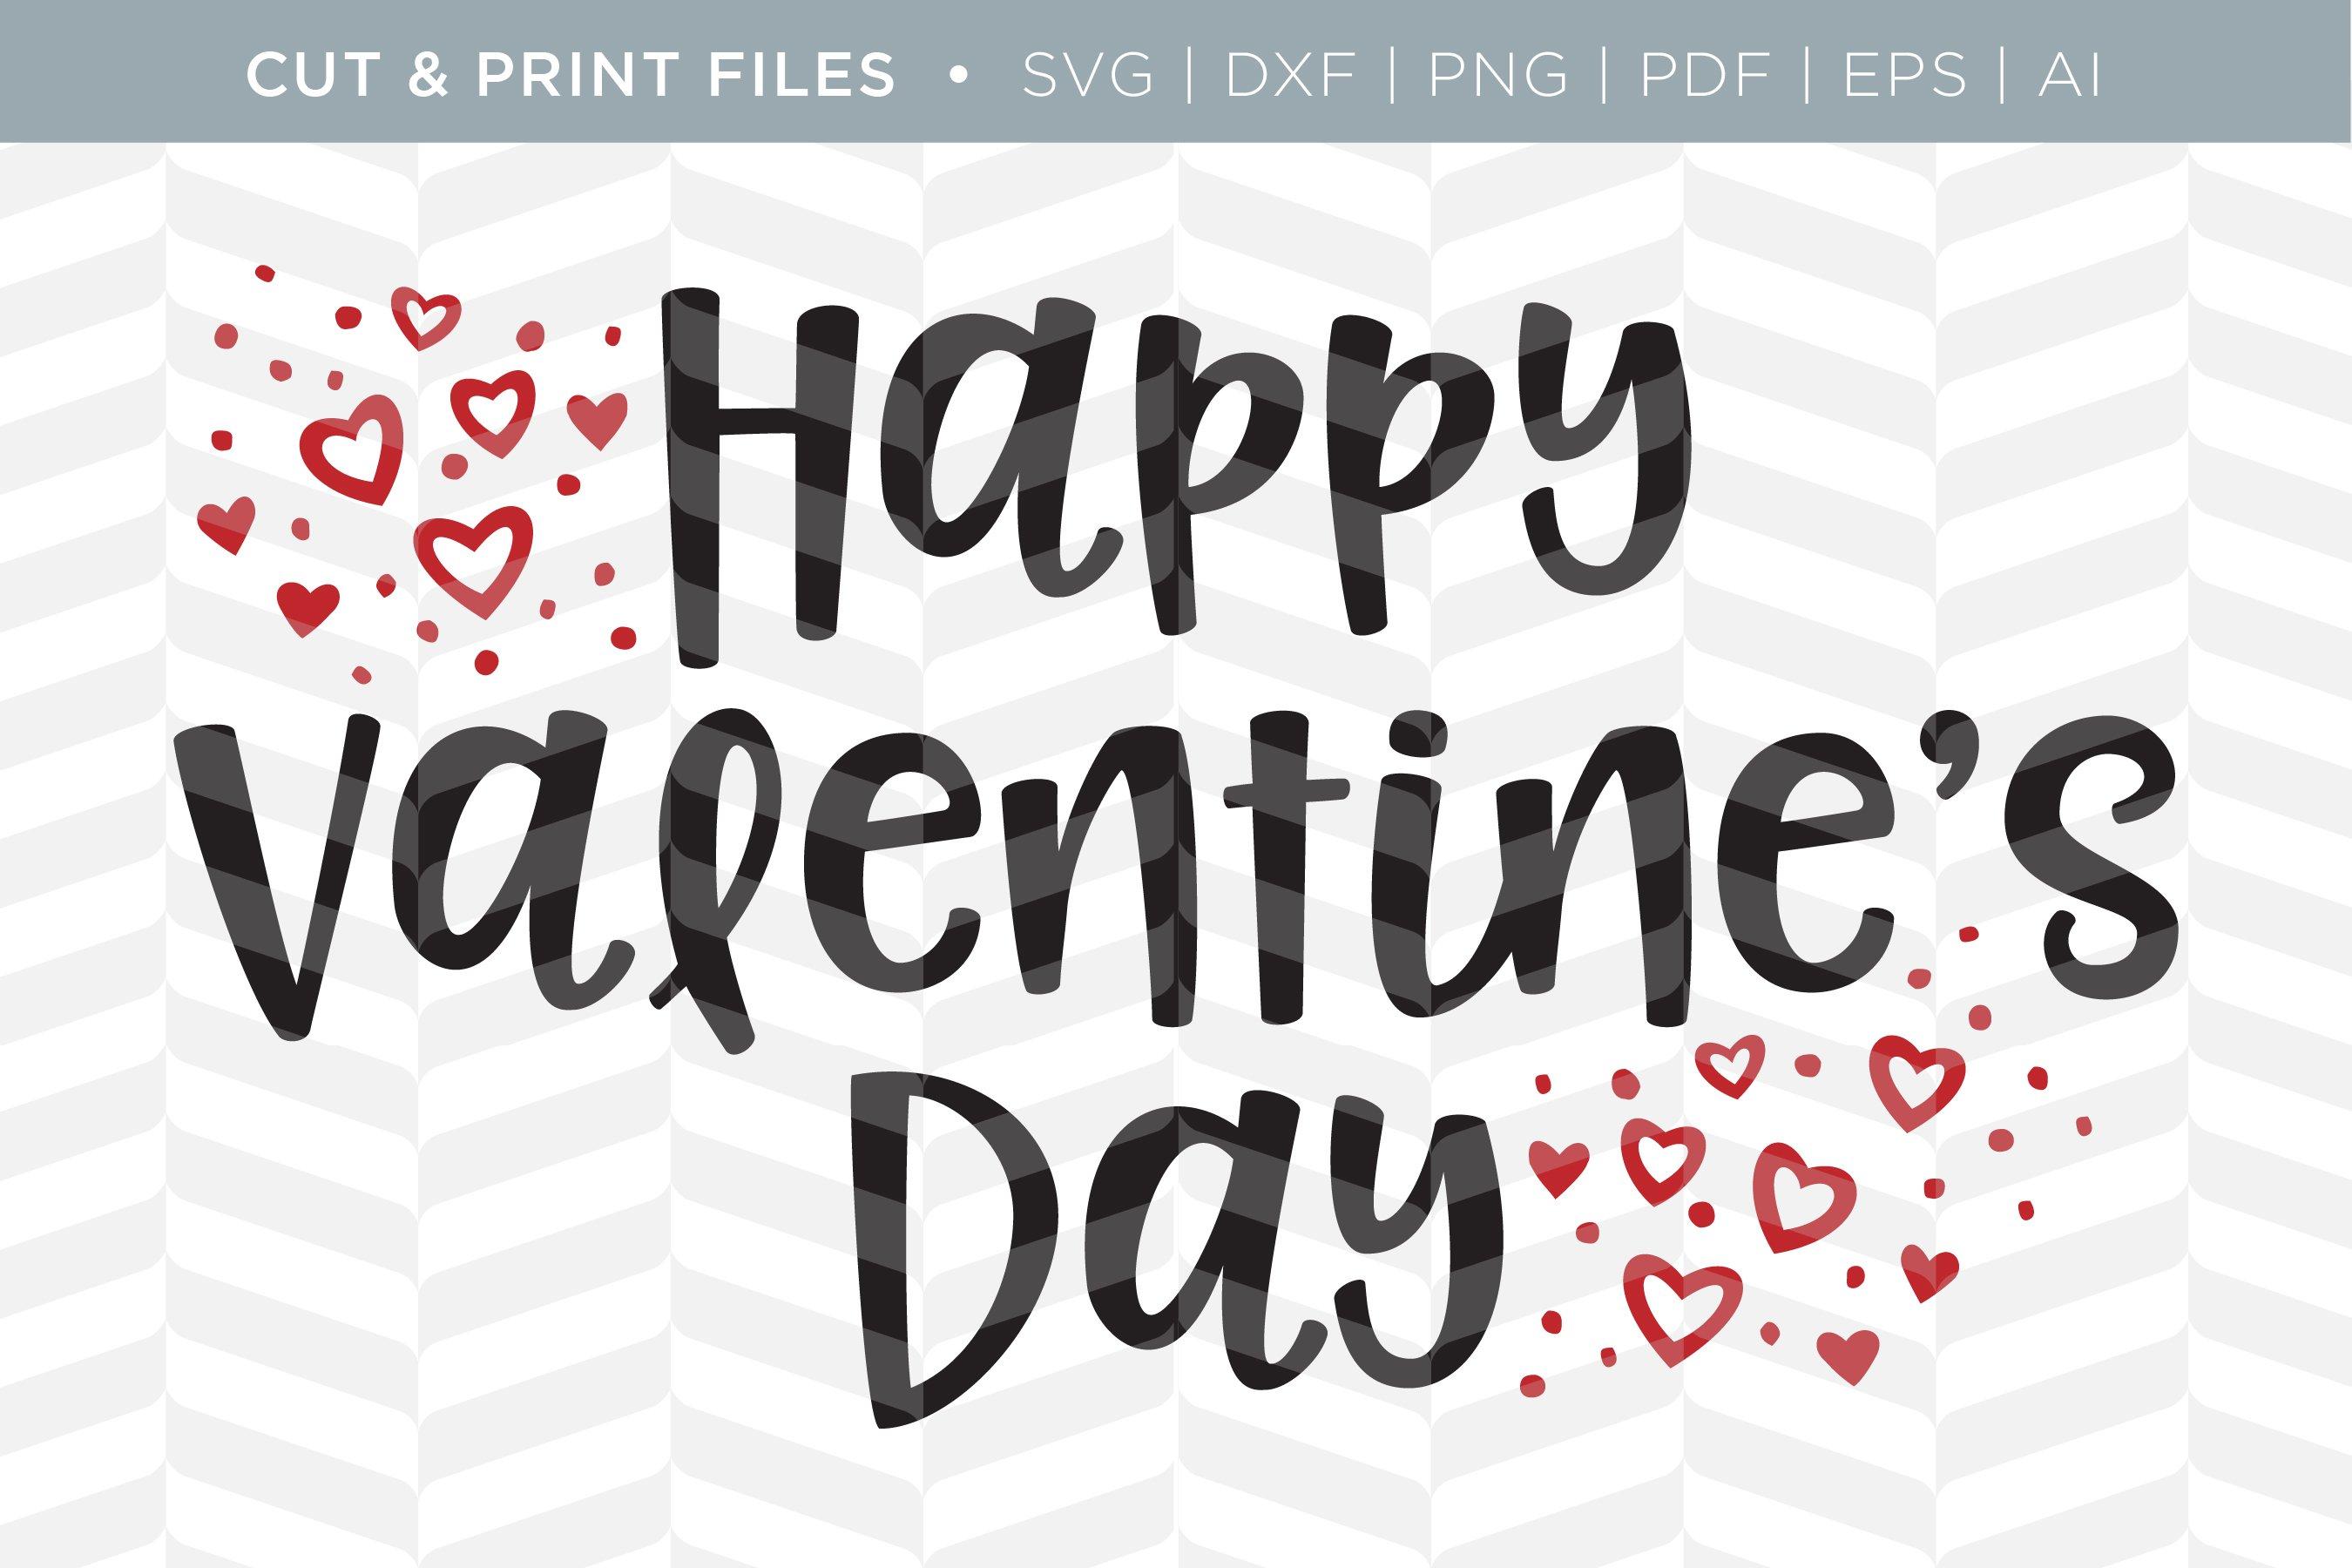 Valentines Svg Cut Print Files Pre Designed Illustrator Graphics Creative Market